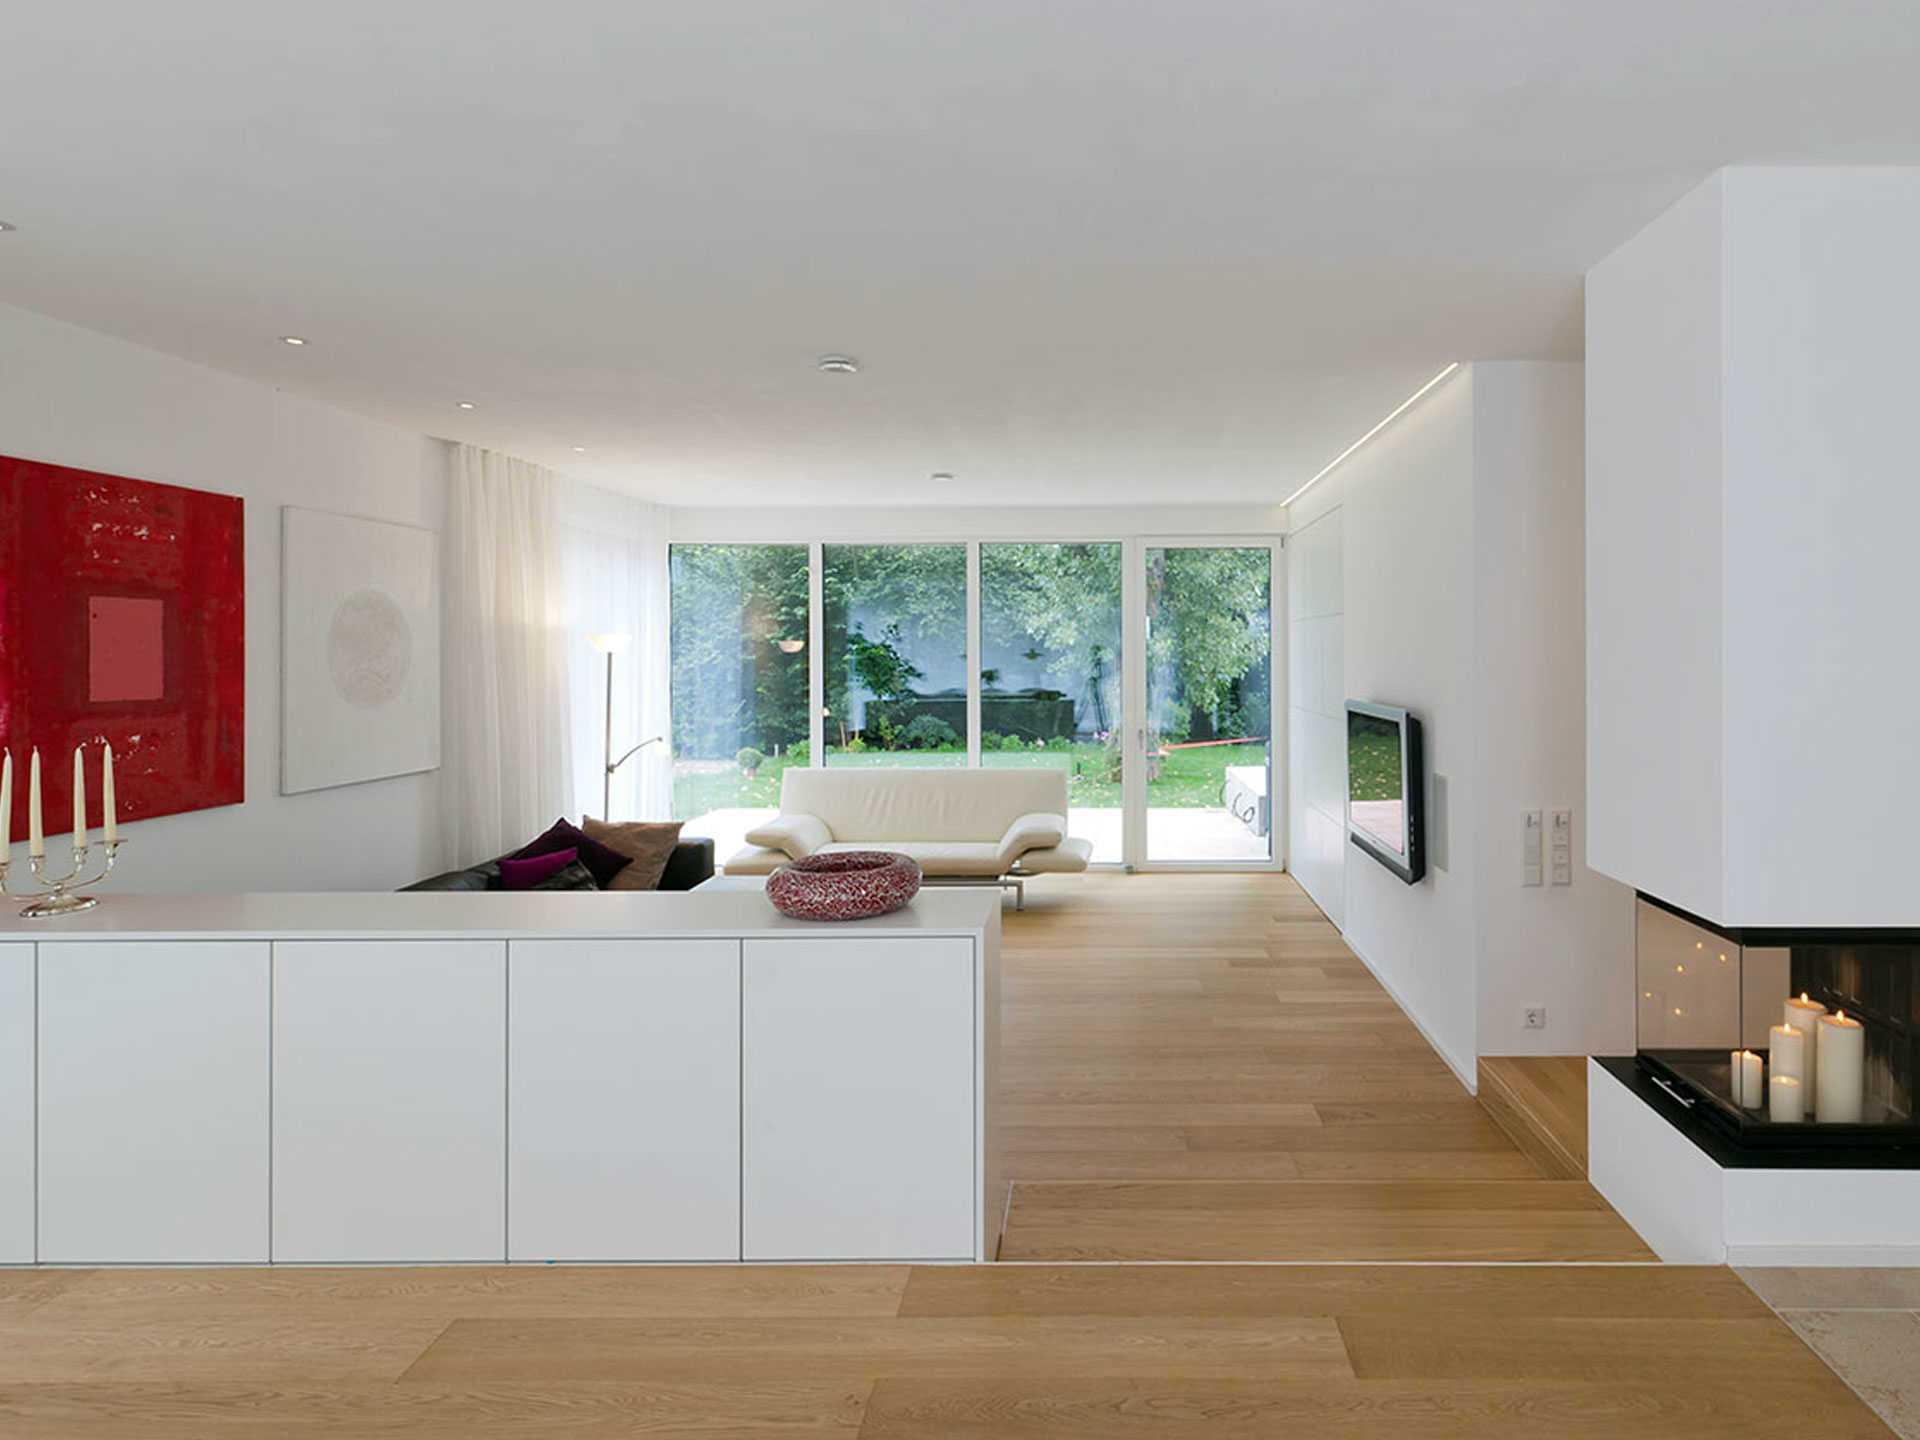 Referenzhaus stuttgart kitzlingerhaus for Wohnzimmer stuttgart